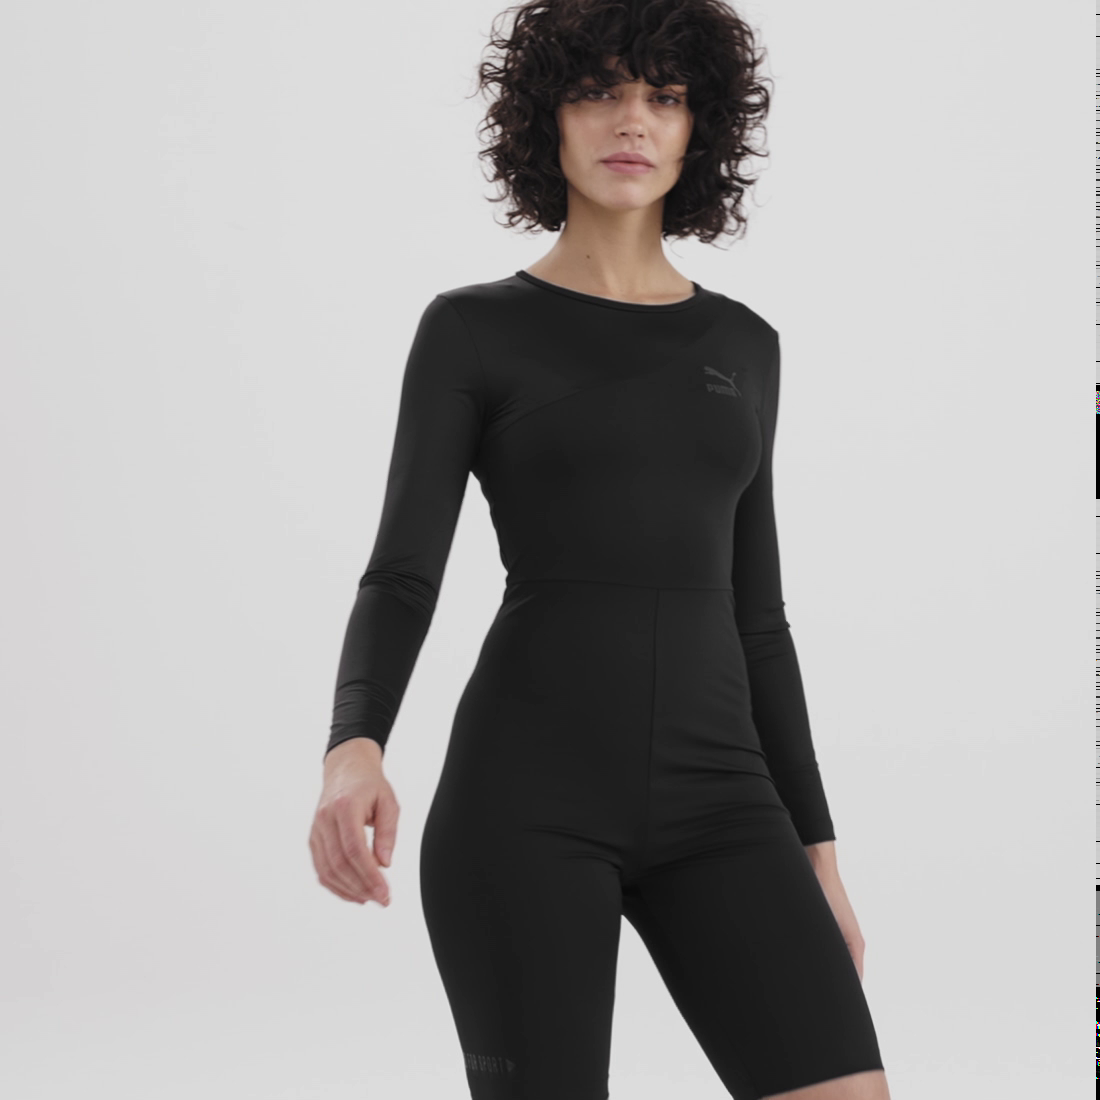 Image Puma Tailored for Sport Fashion Women's Unitard #6